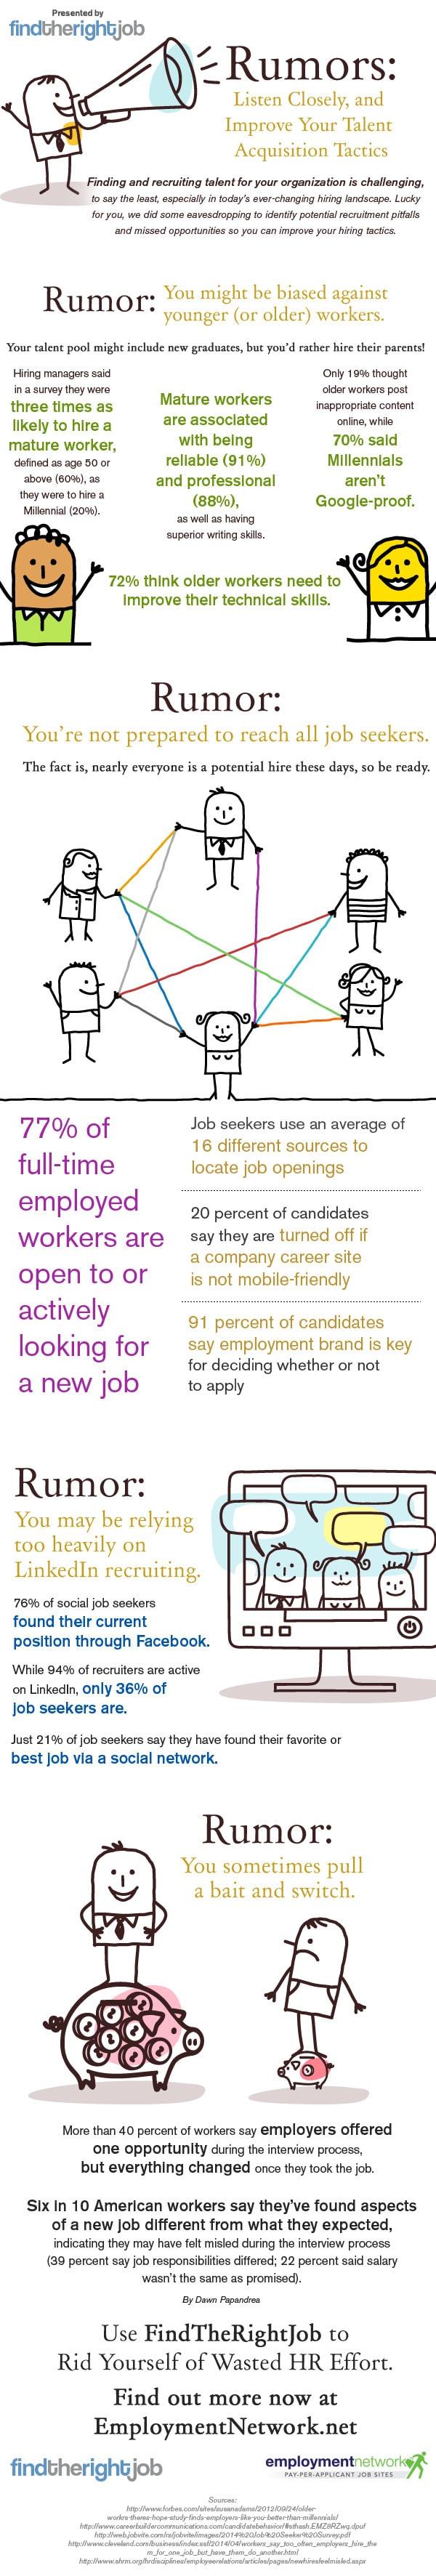 infographic-rumors